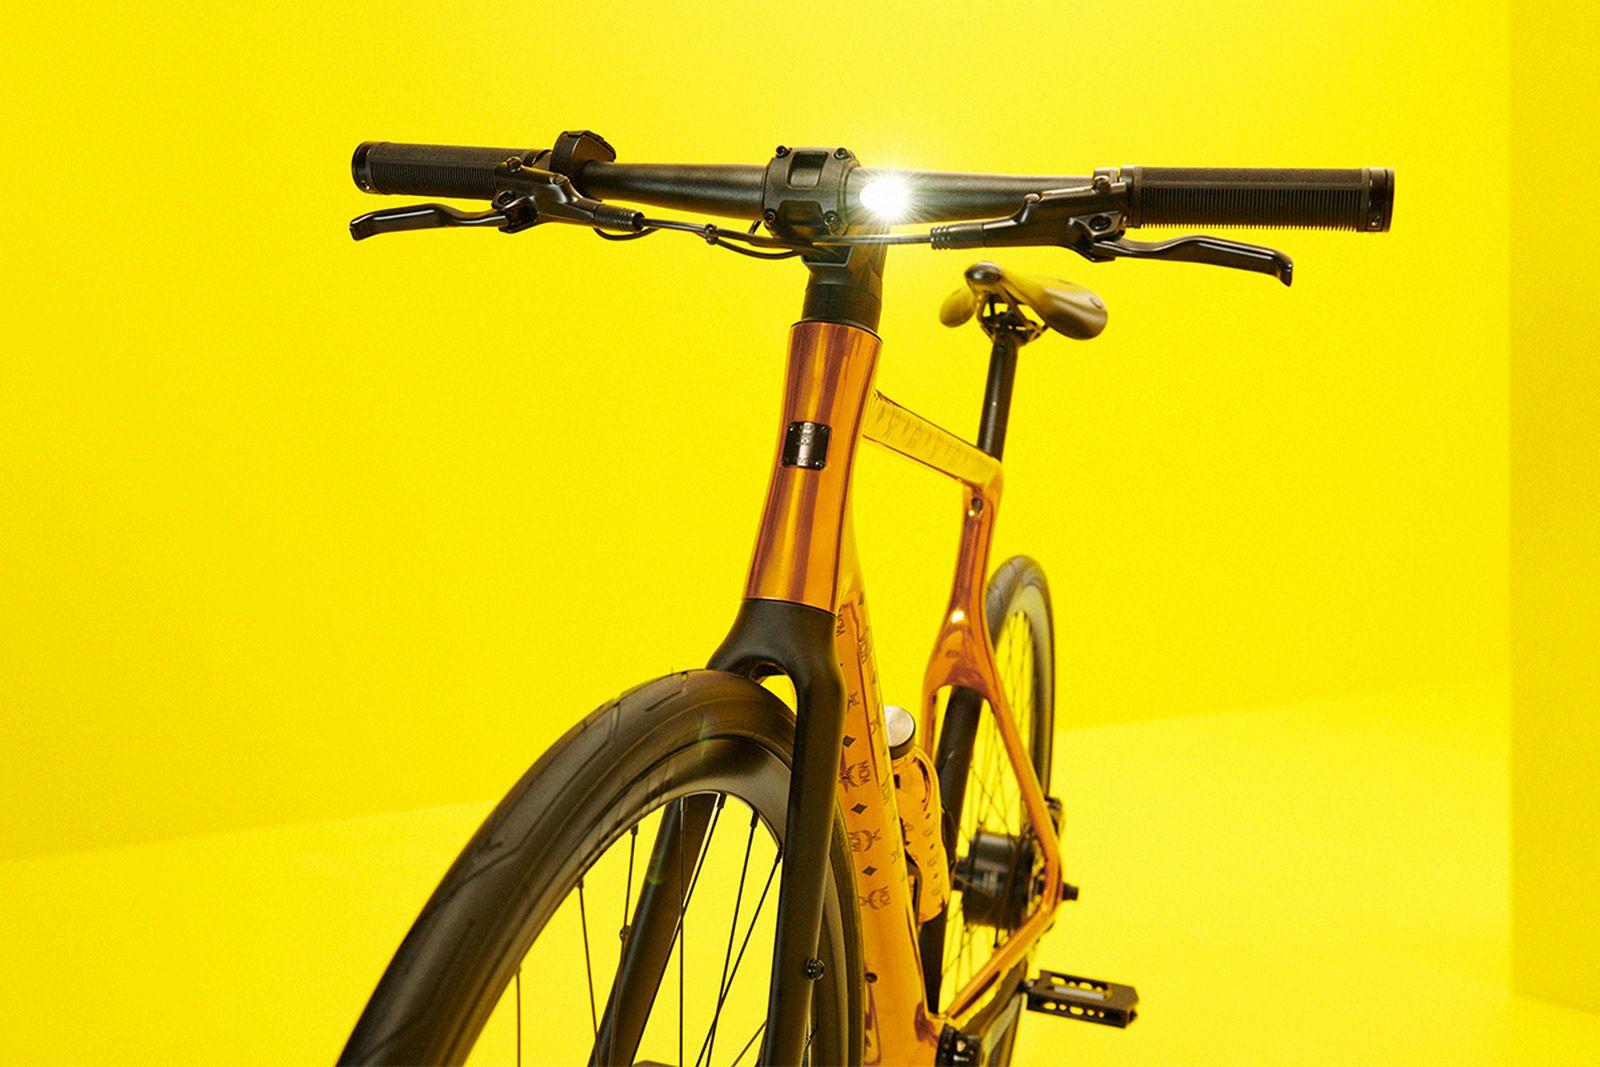 mcm-urwahn-e-bike-02